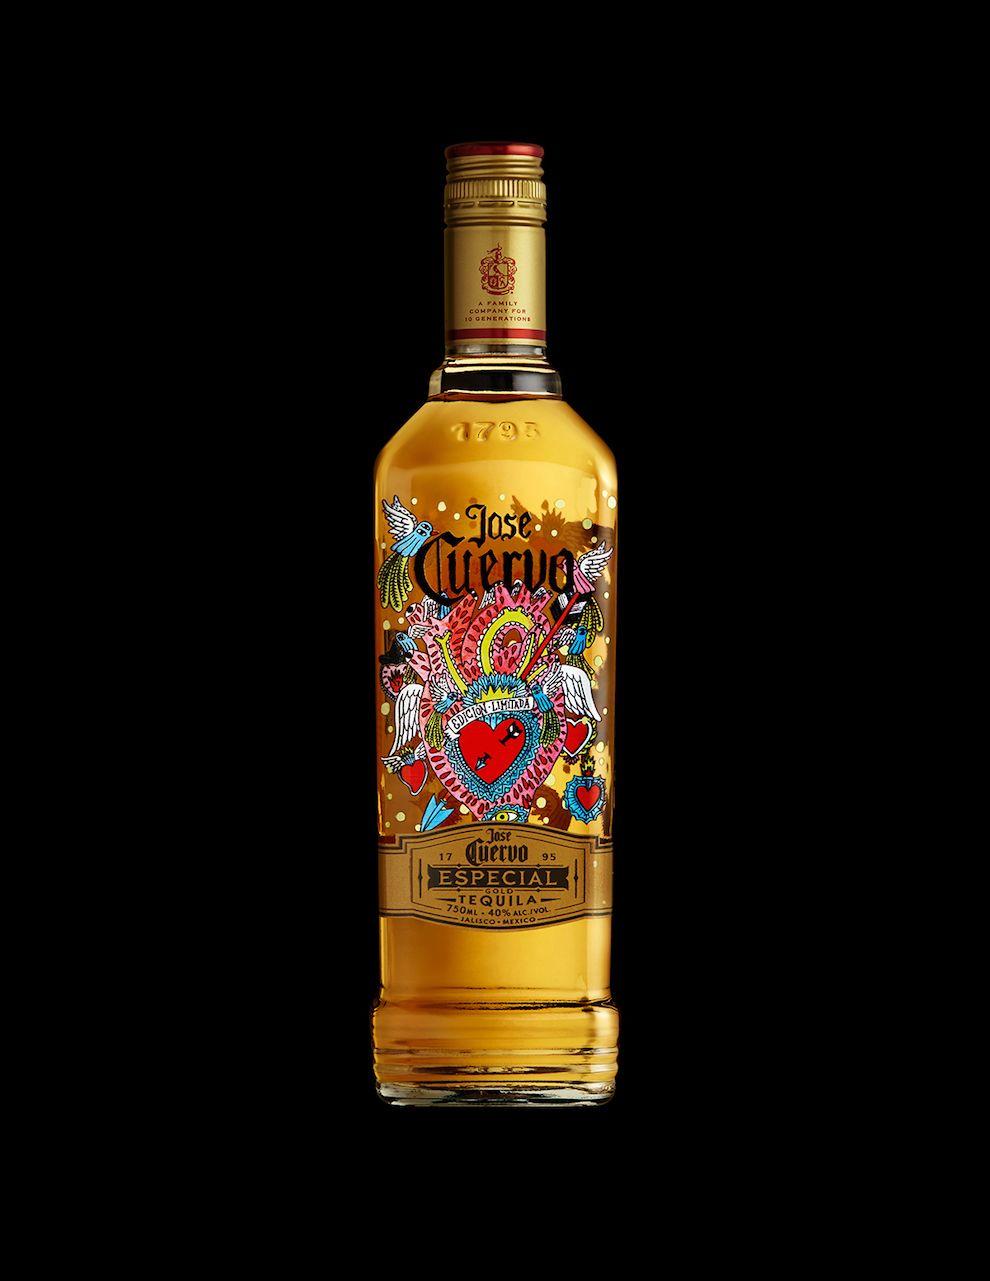 Jose Cuervo's 222 Vibrant Bottle Design